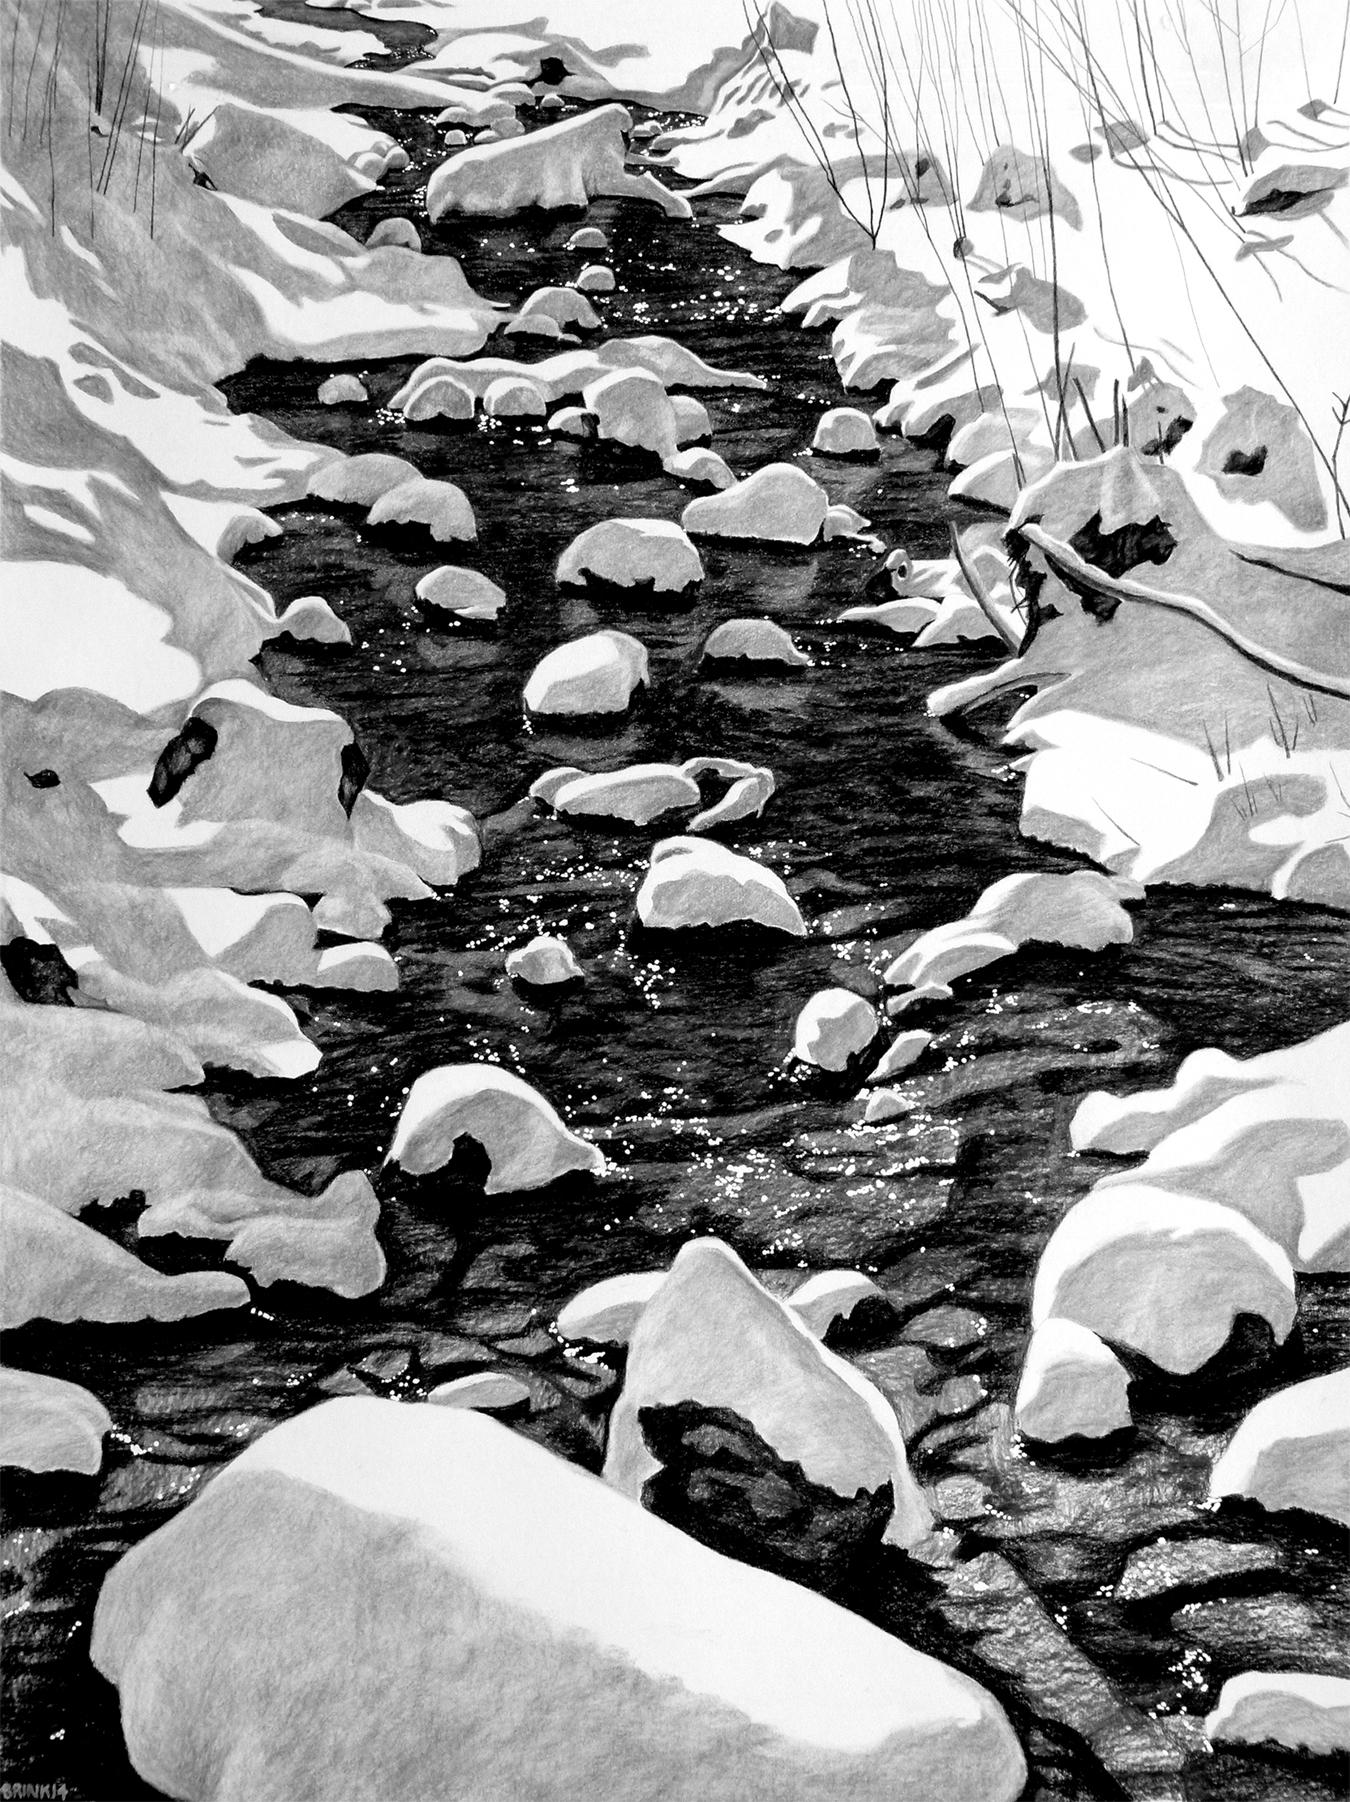 The Draw 2 - 150 Feet Below Zen, 44 x 33 in, charcoal, conté + gauche on paper, 2014